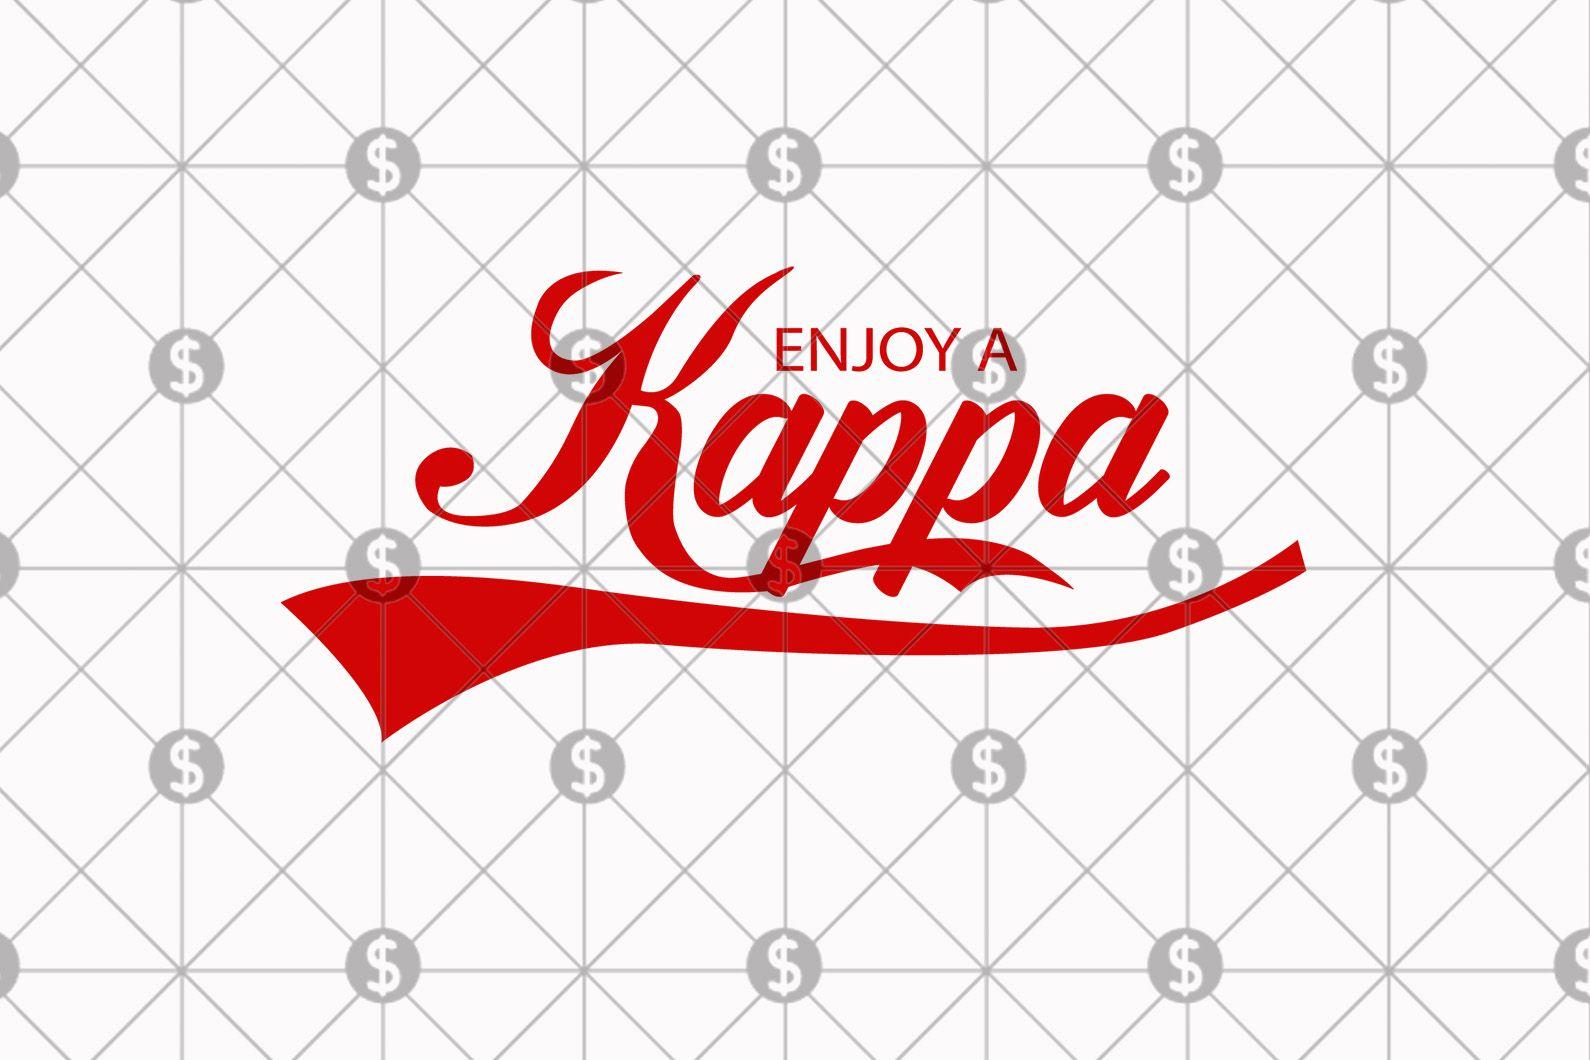 Download Pin on Kappa alpha psi